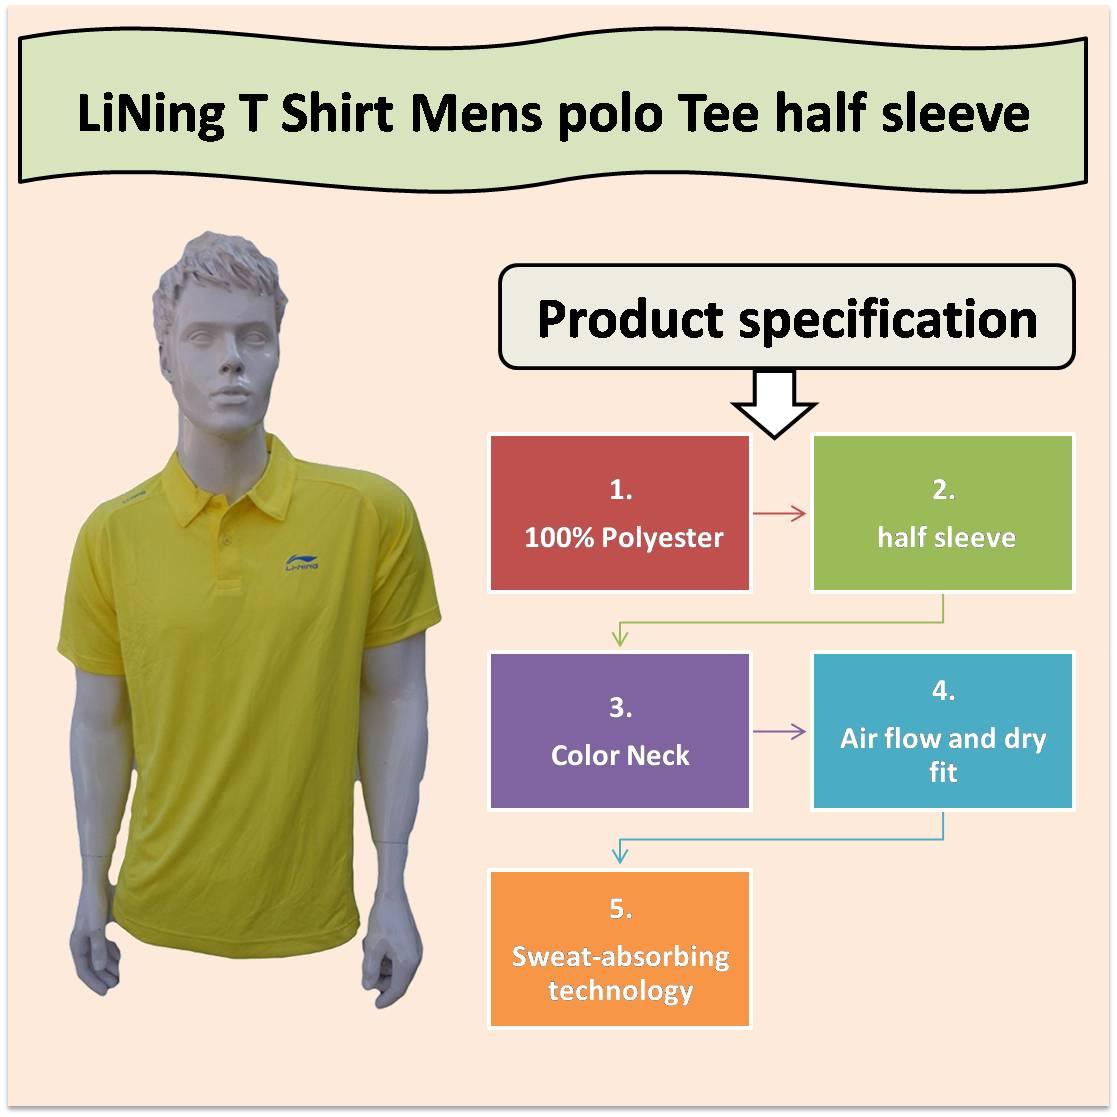 LiNing T Shirt Mens polo Tee half sleeve